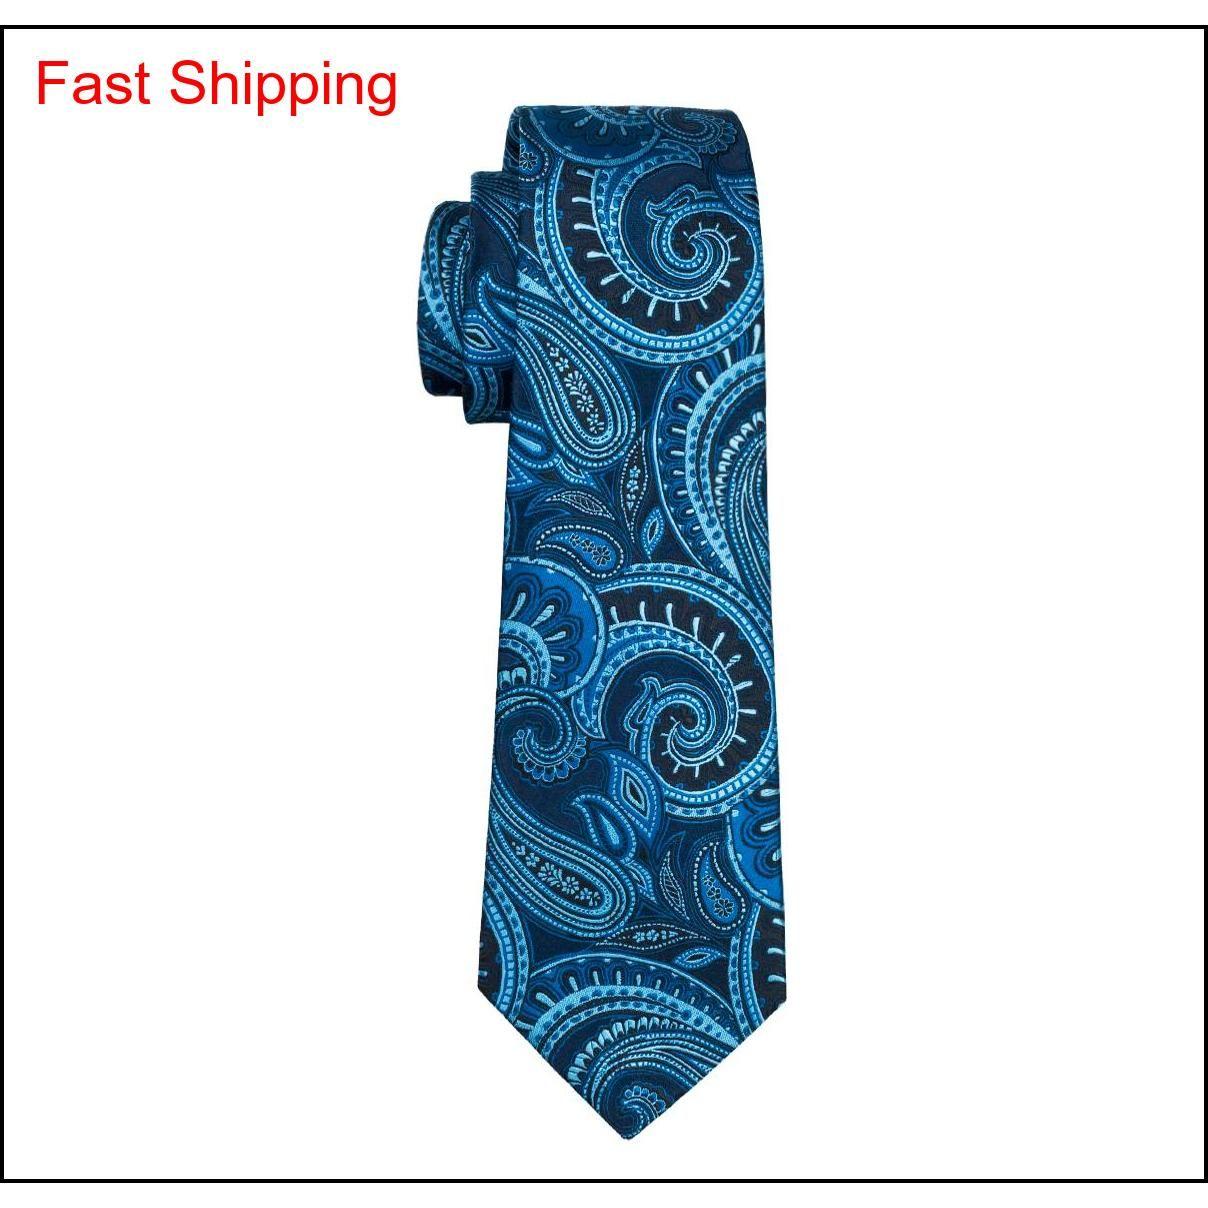 Crassici da uomo in seta Cravatte Blue Tie Set Paisley Men Ties Tie Tie Hanky Gemelli Jacquard Incontro commerciale tessuto Woven We Qylluu Queen66